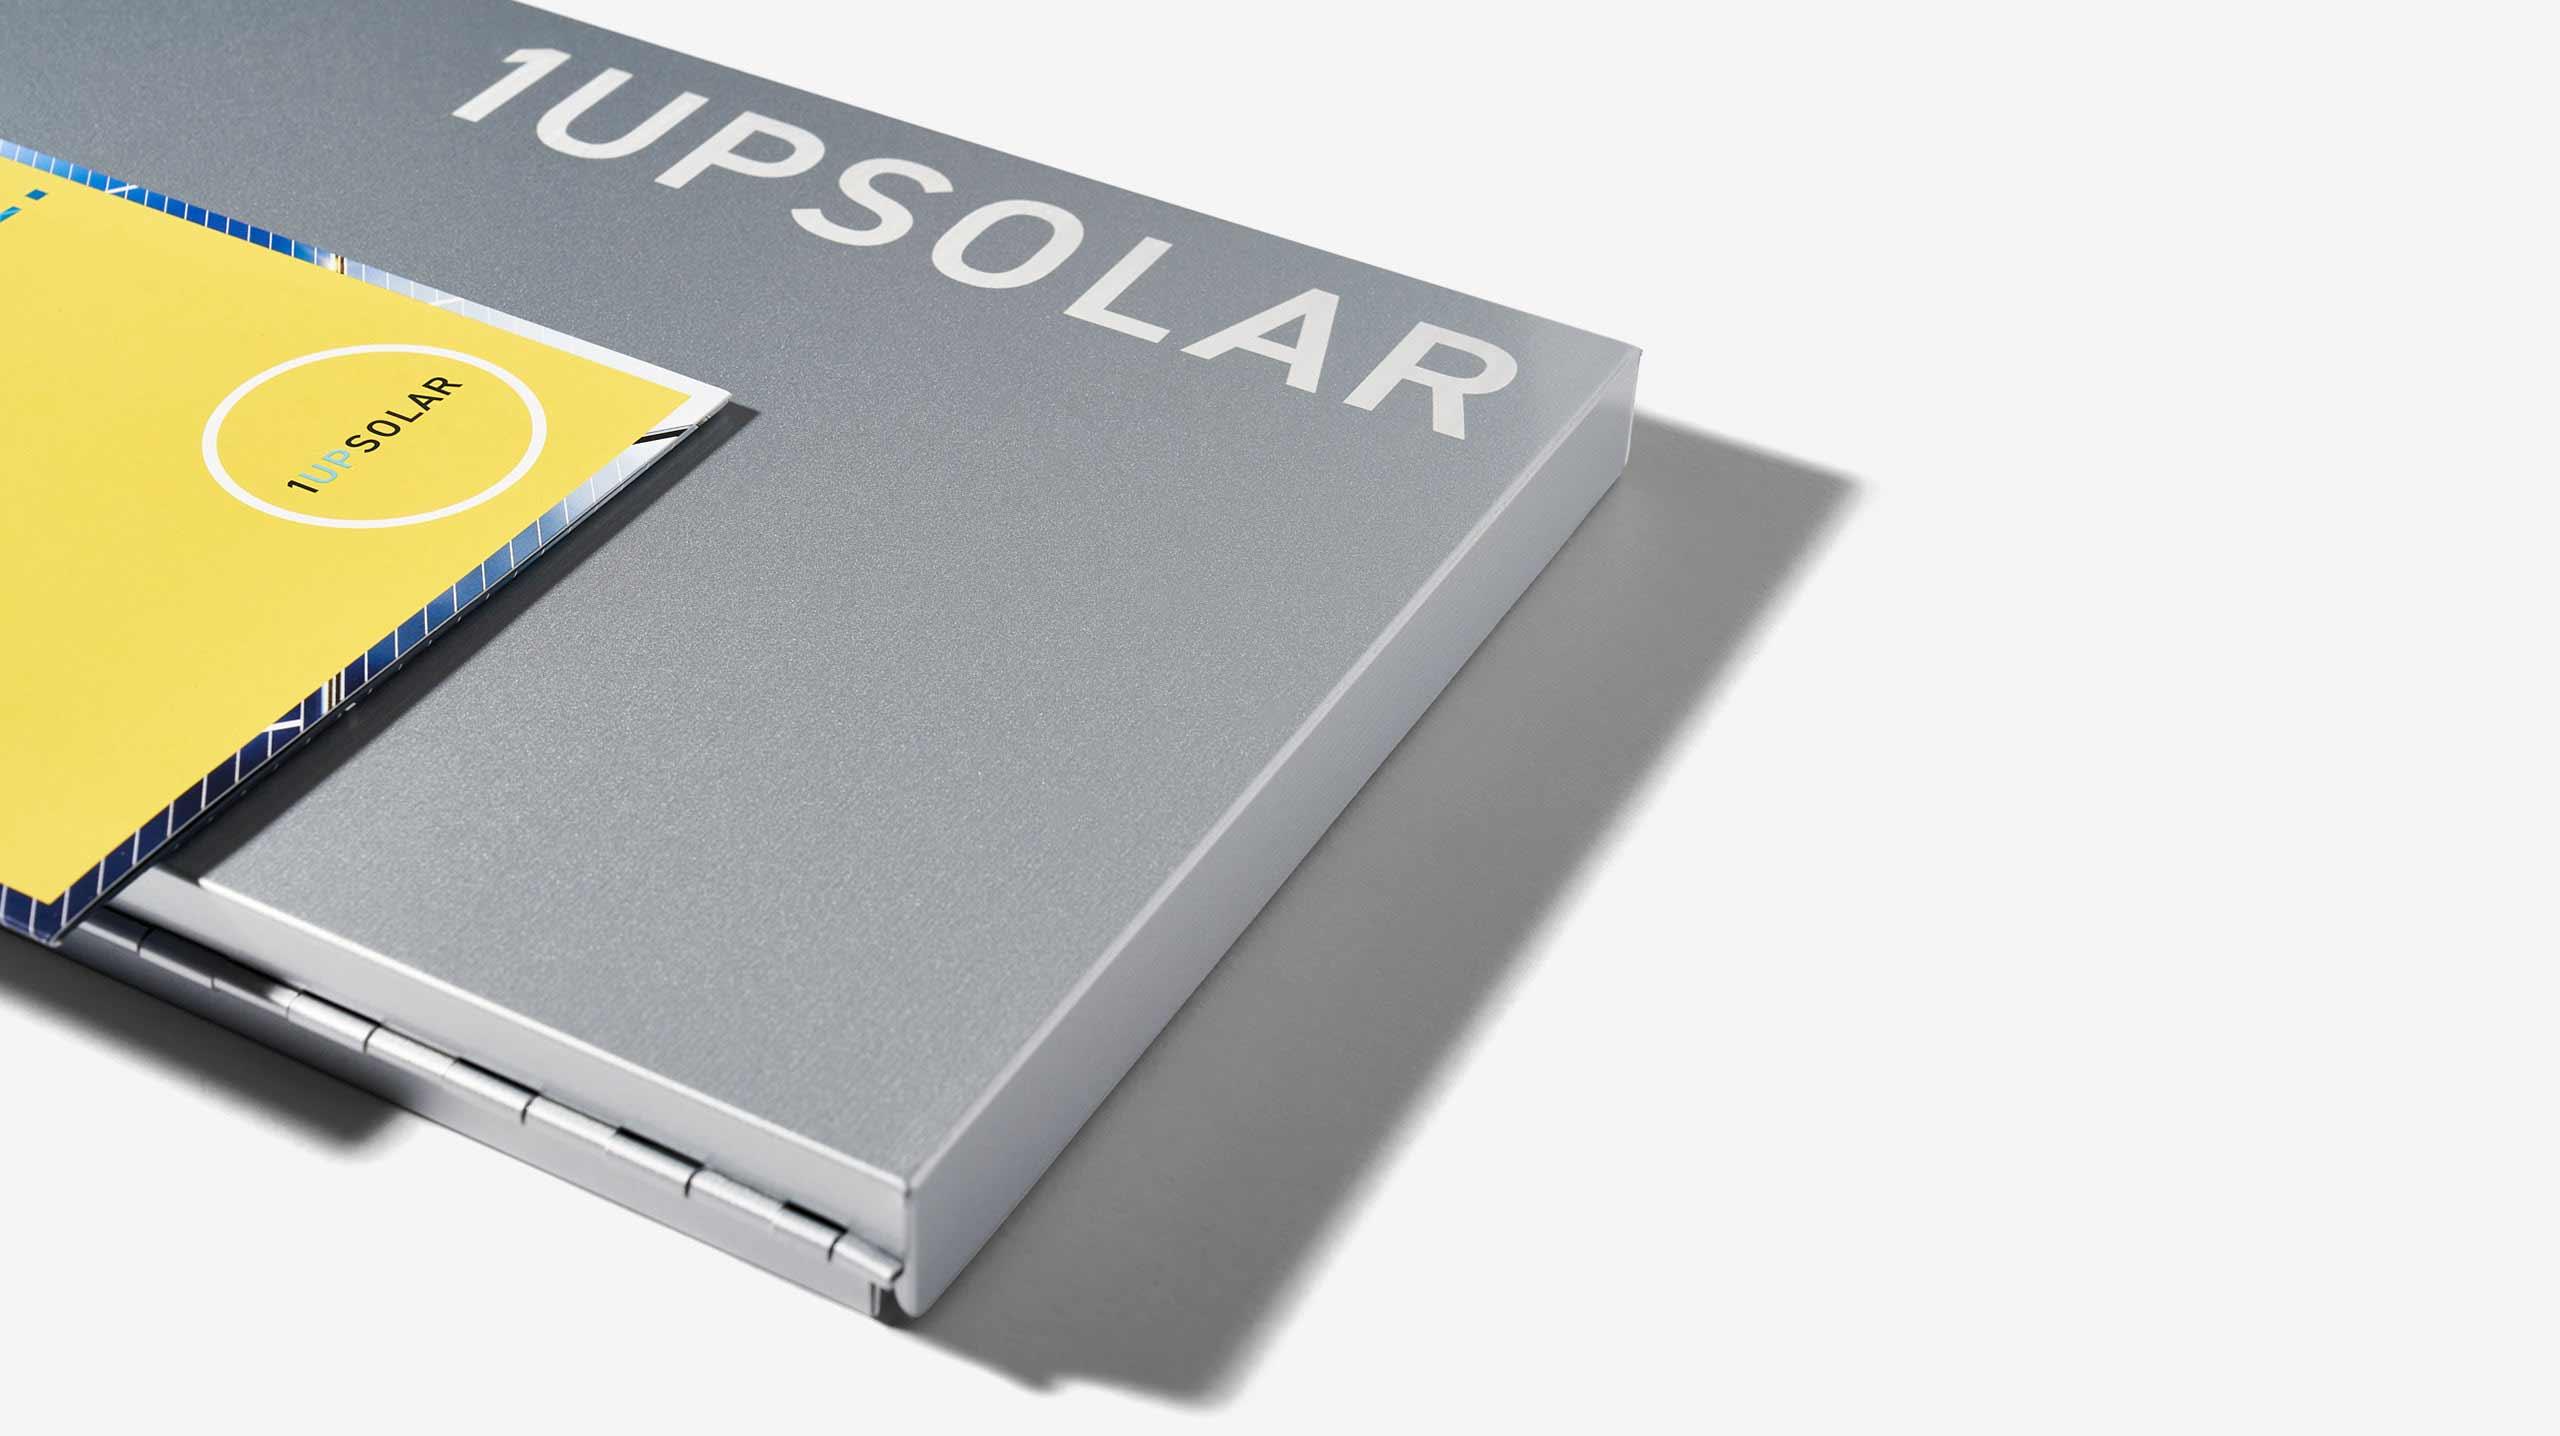 1UpSolar Street Team Aluminum Etched Folder